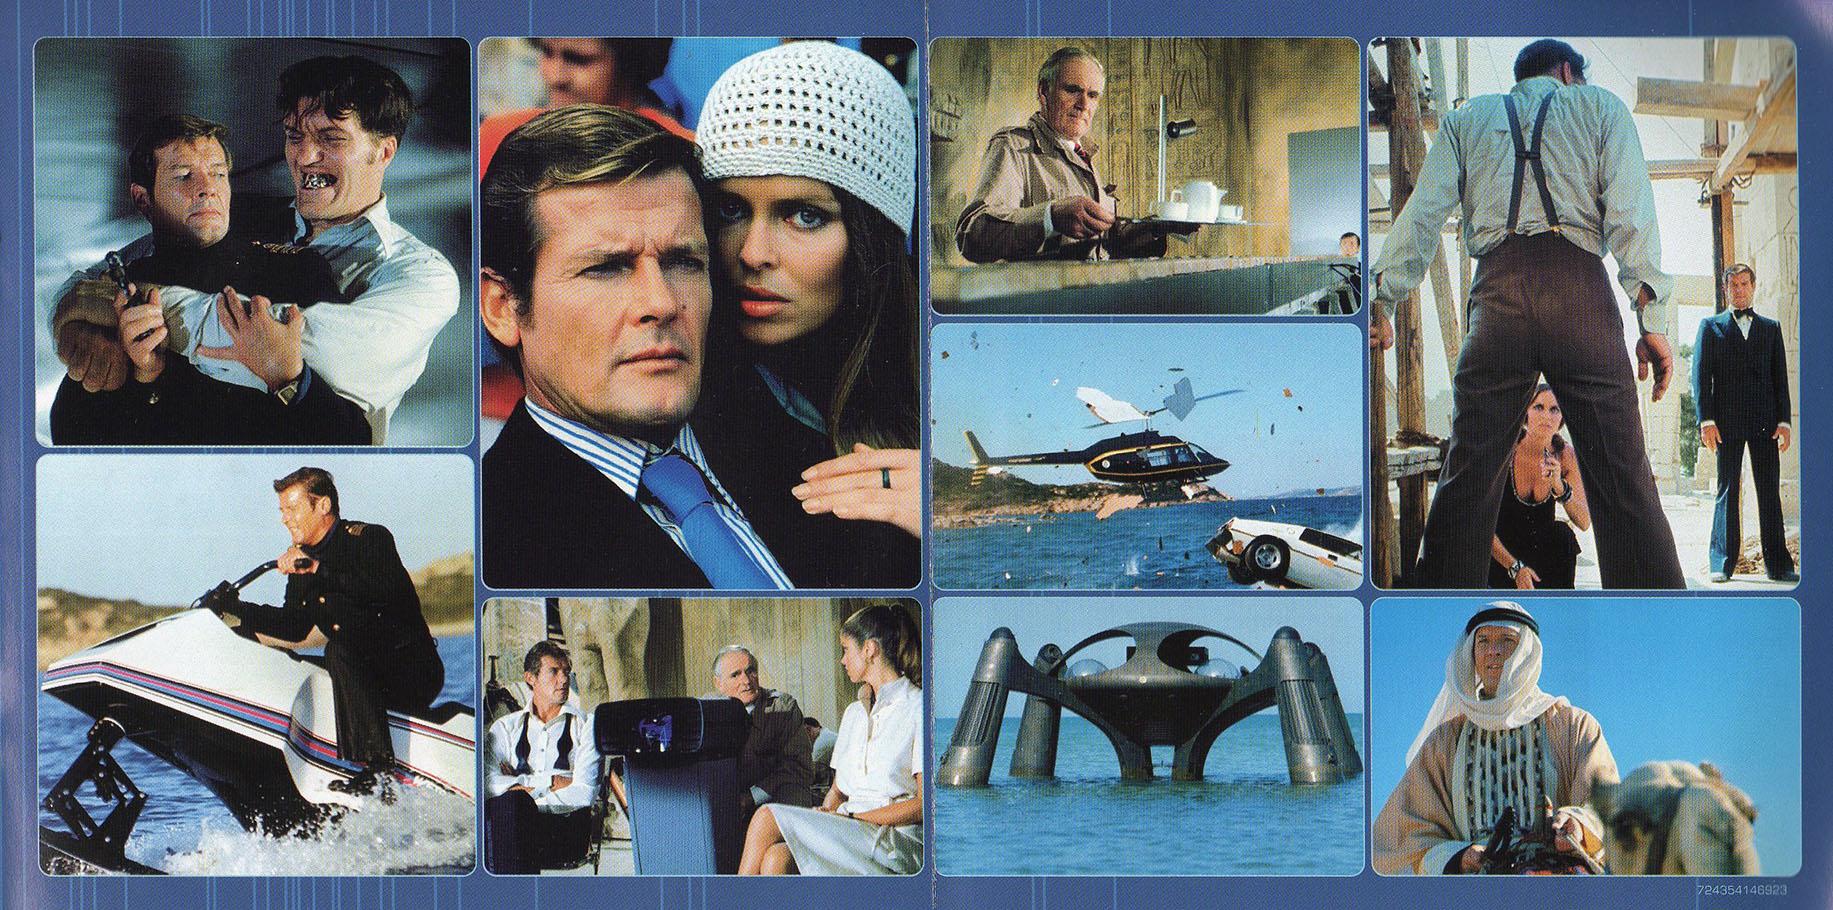 Marvin Hamlisch, Carly Simon - The Spy Who Loved Me ...The Spy Who Loved Me Soundtrack Carly Simon